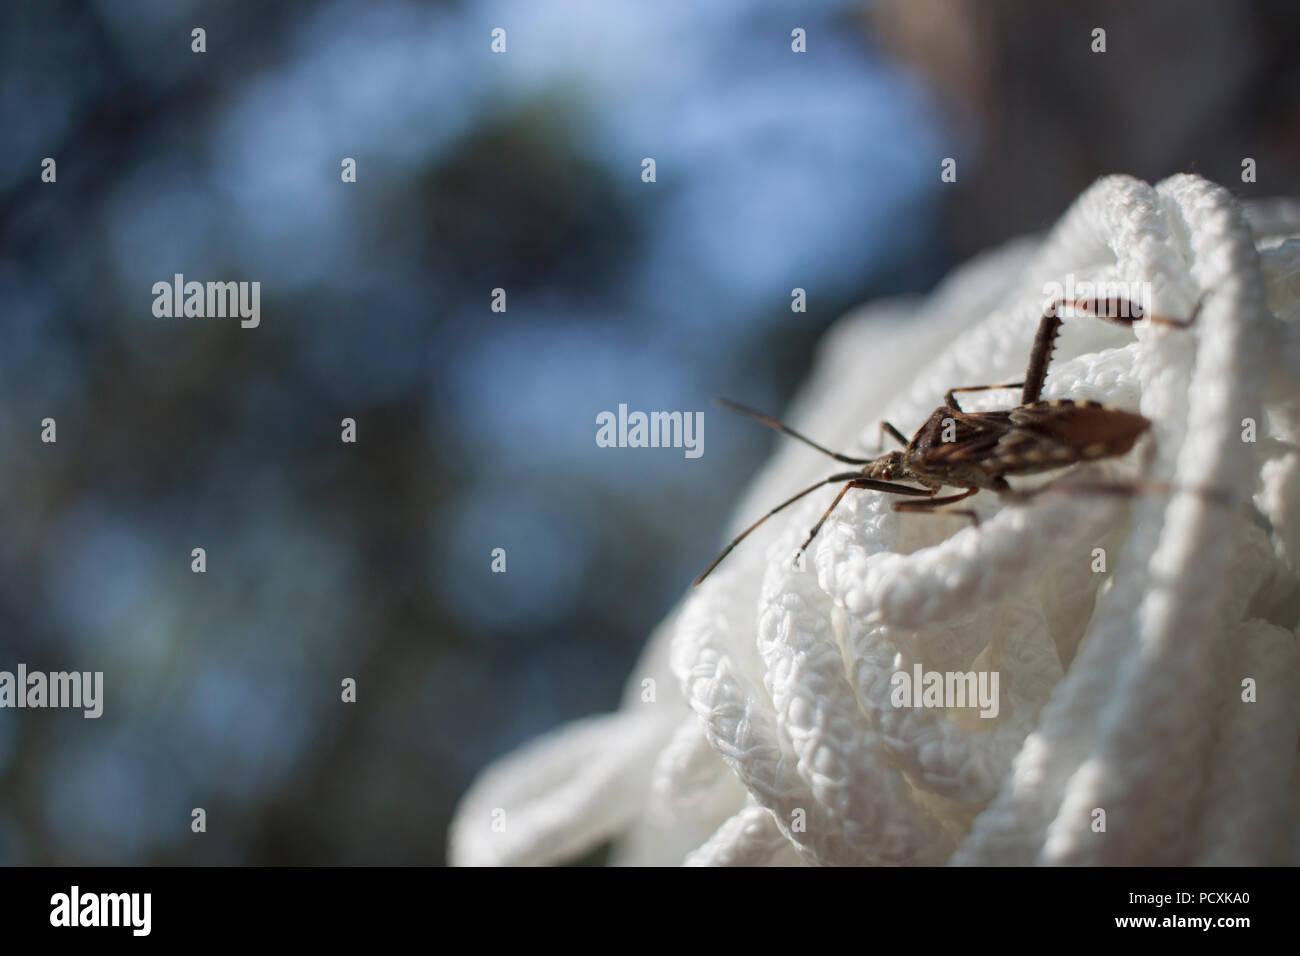 Bug ( Leptoglossus occidentalis ) on rope - Stock Image